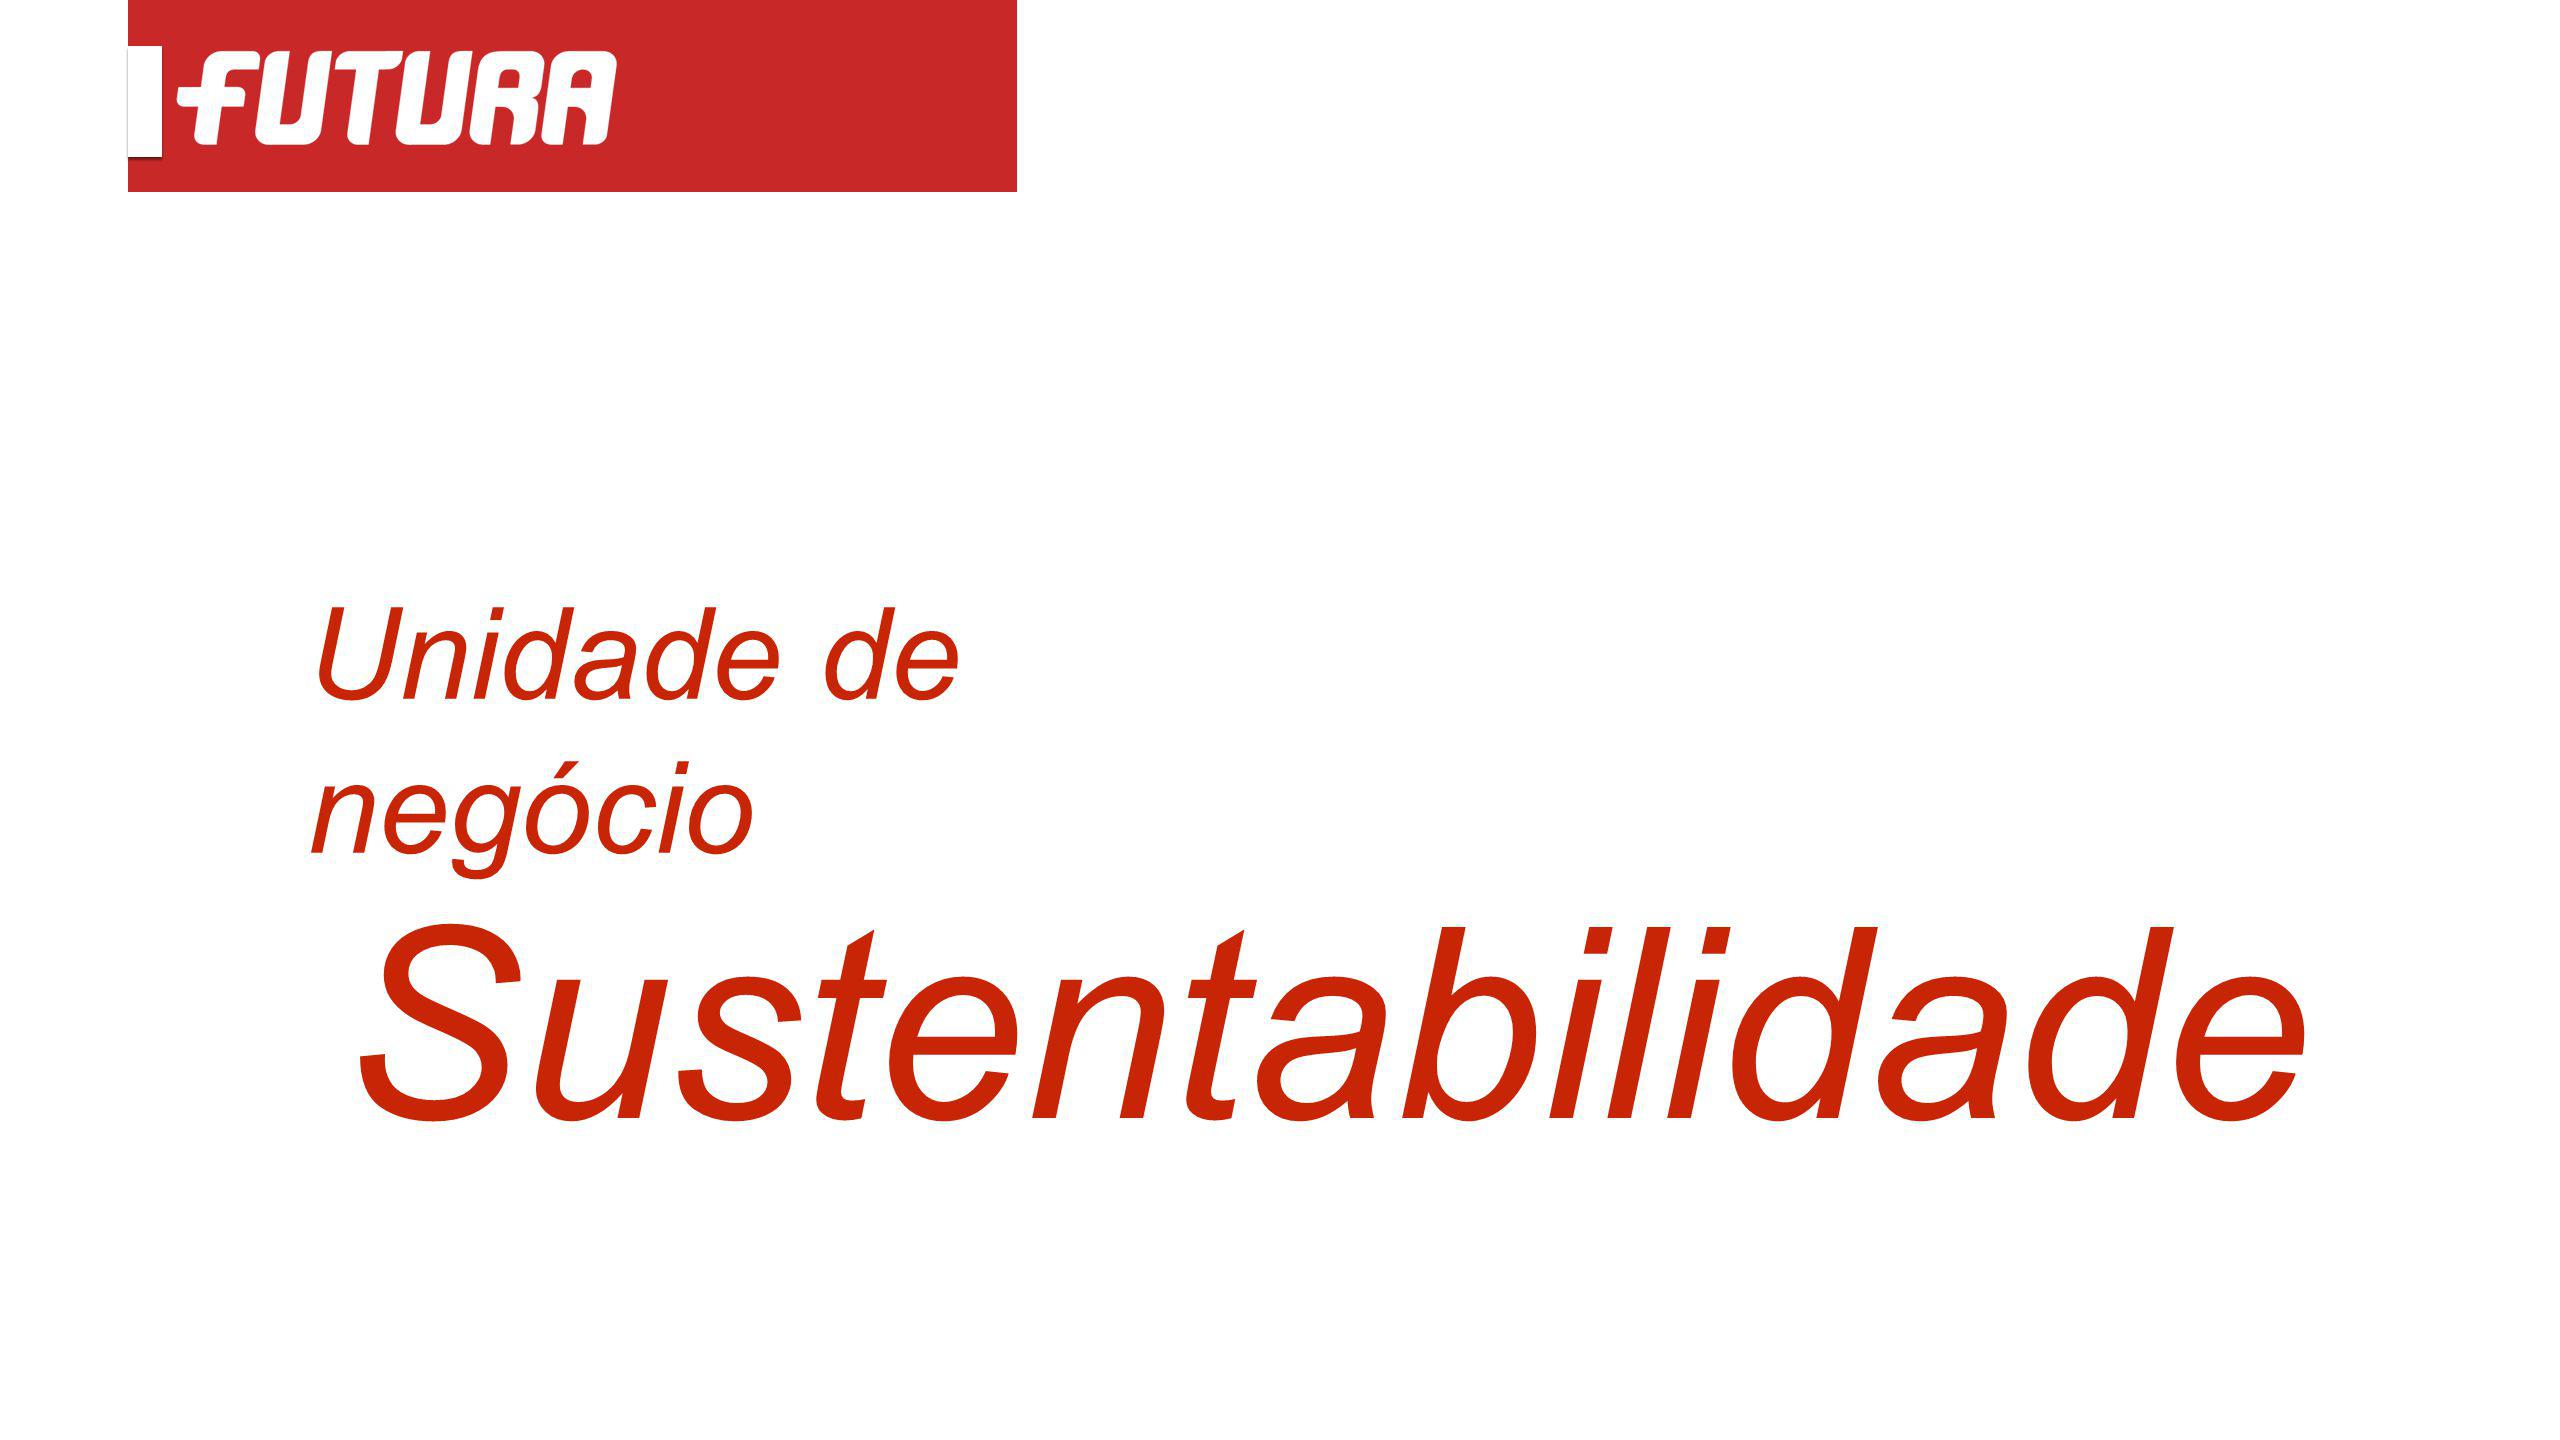 Unidade de negócio Sustentabilidade